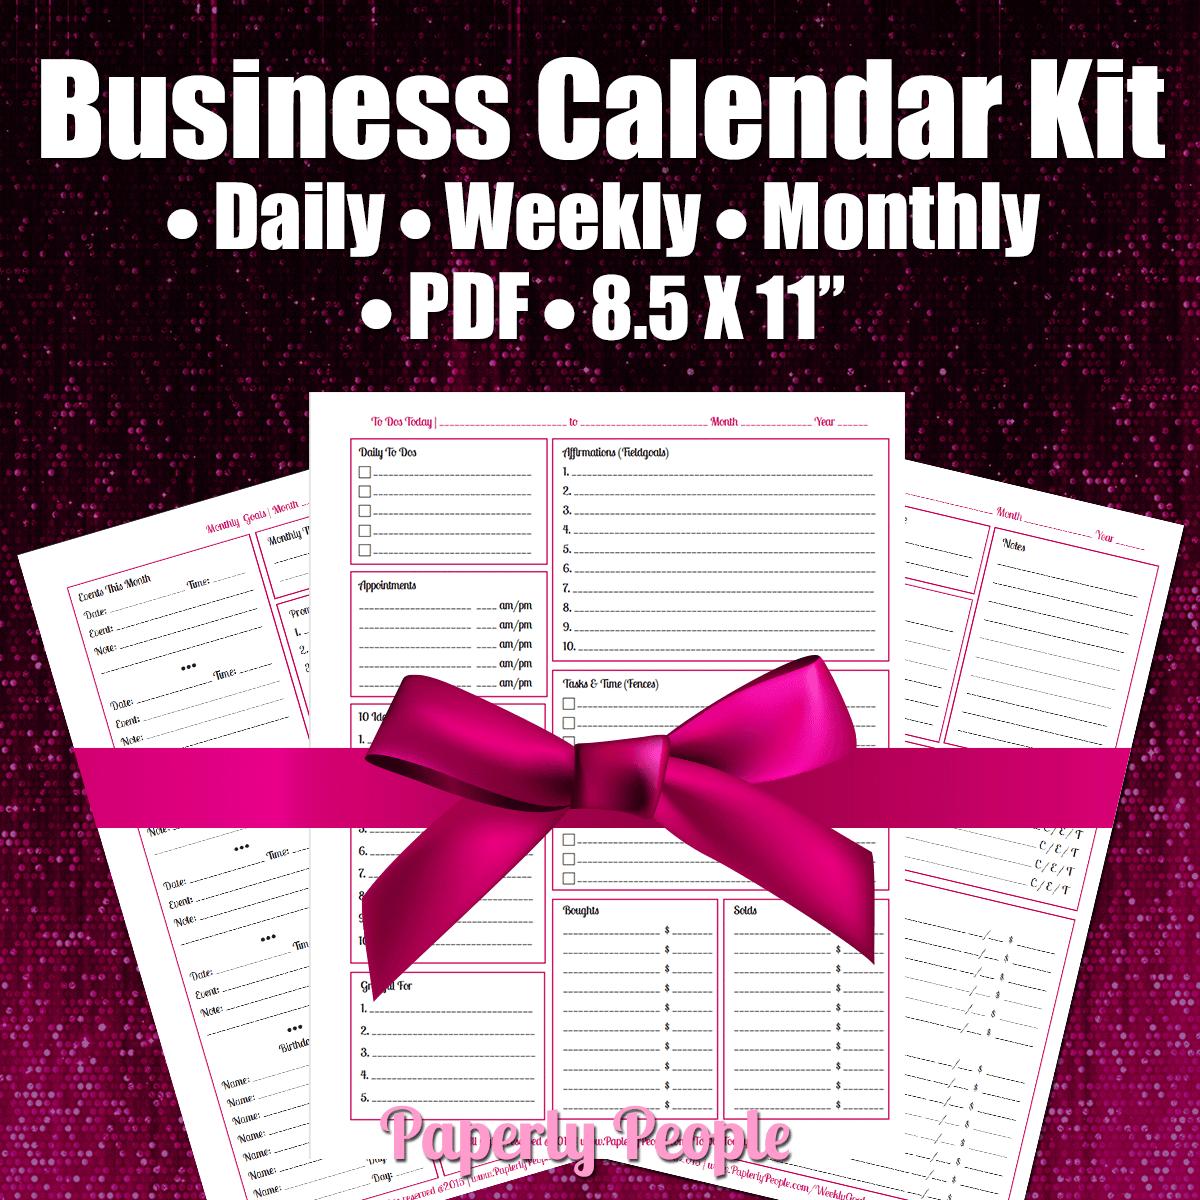 Business Calendar Kit